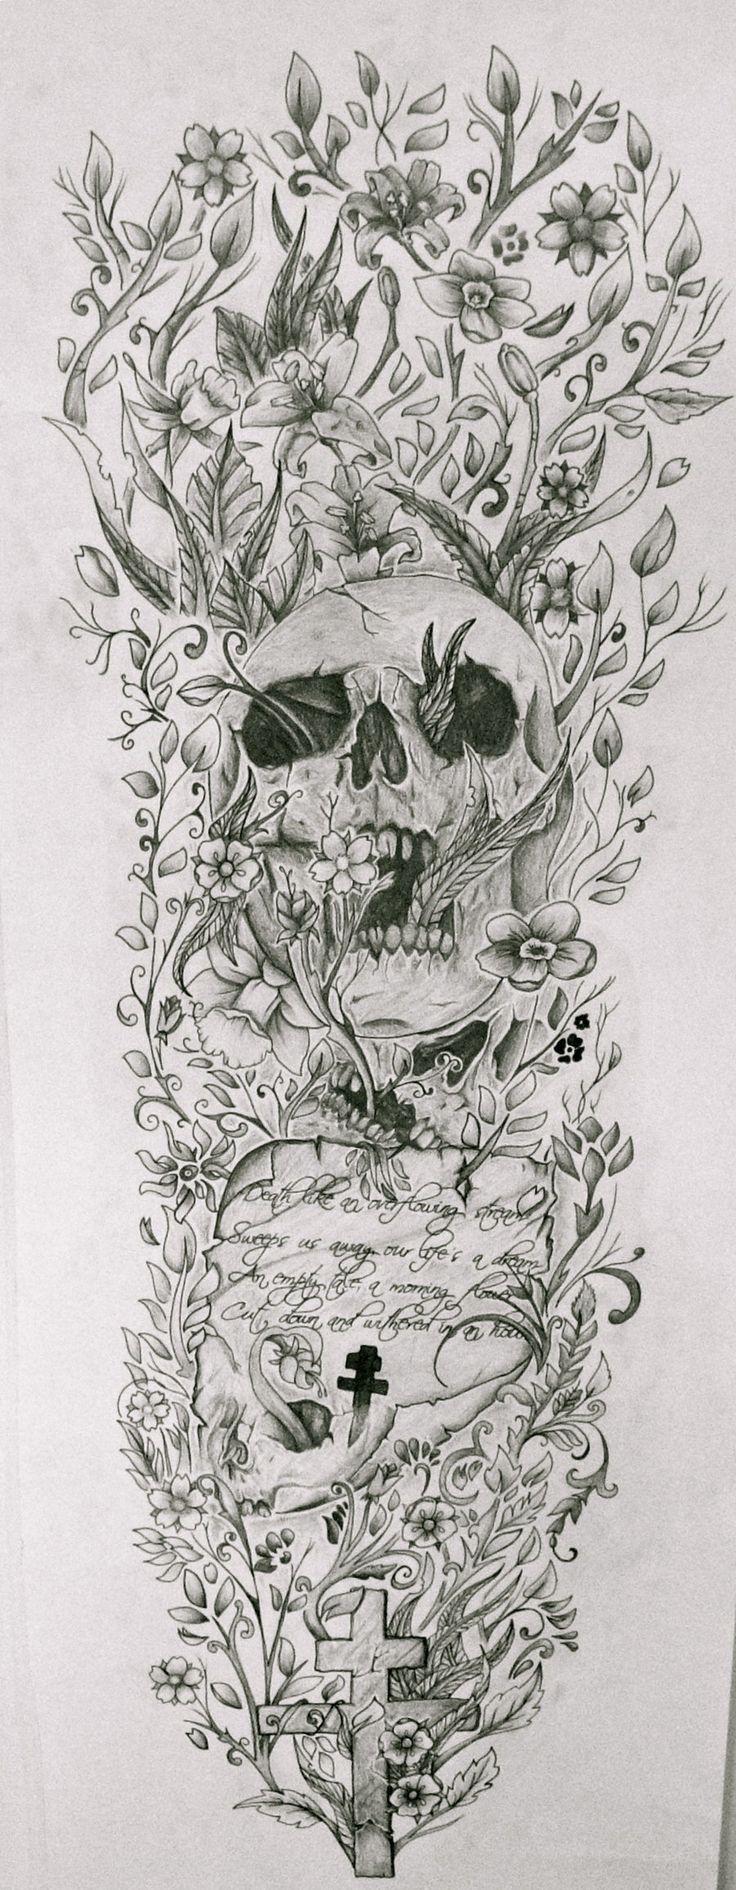 tattoo sleeve drawings Google Search Half sleeve